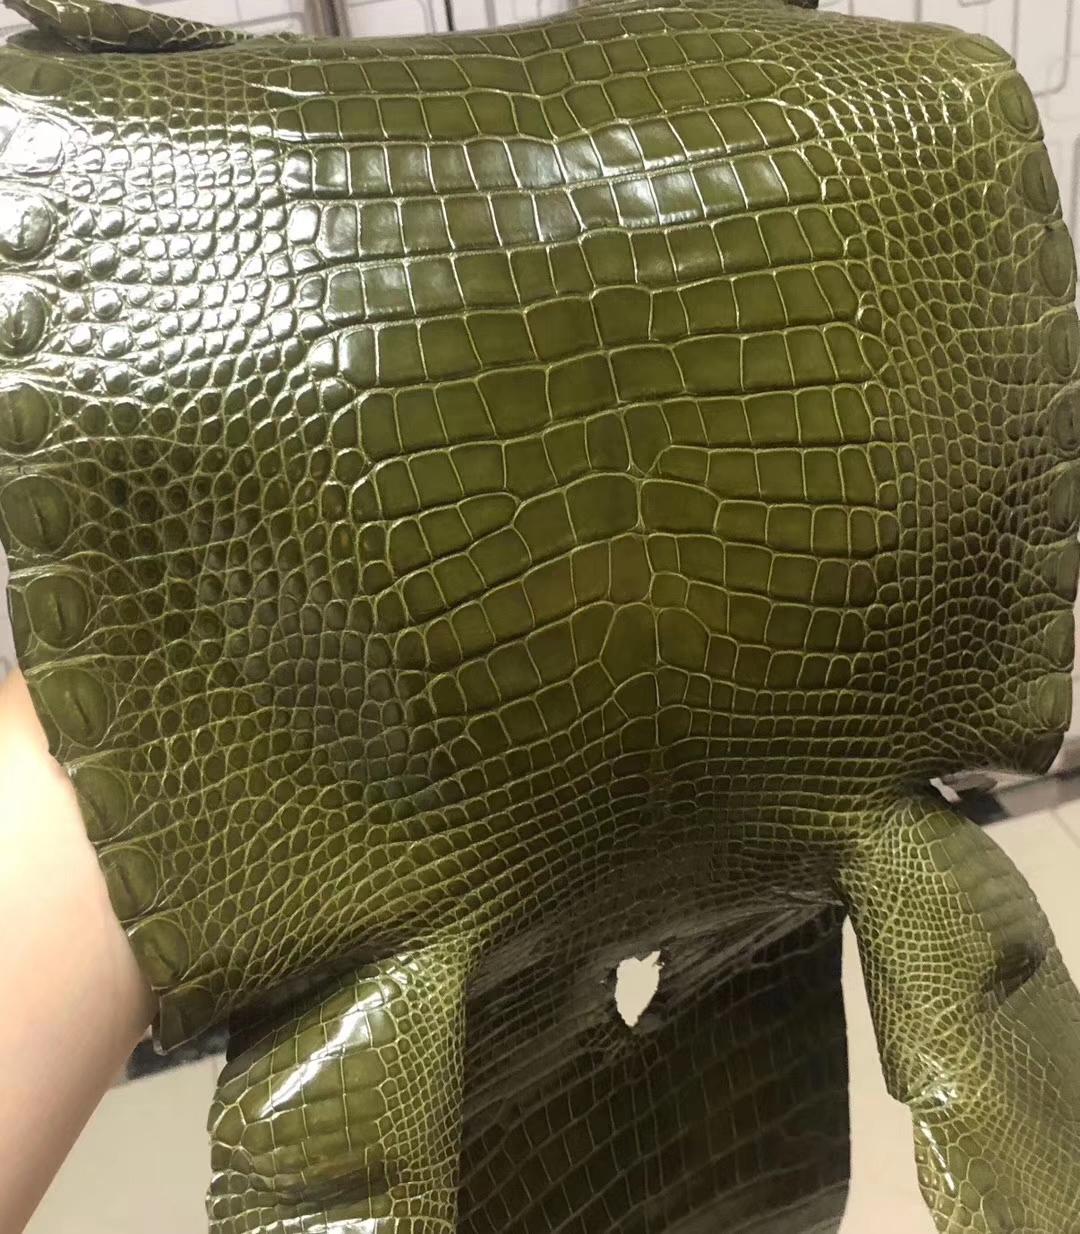 Hermes Constance/Minikelly Bag Customization 6H Vert Olive Shiny CrocodileLeather